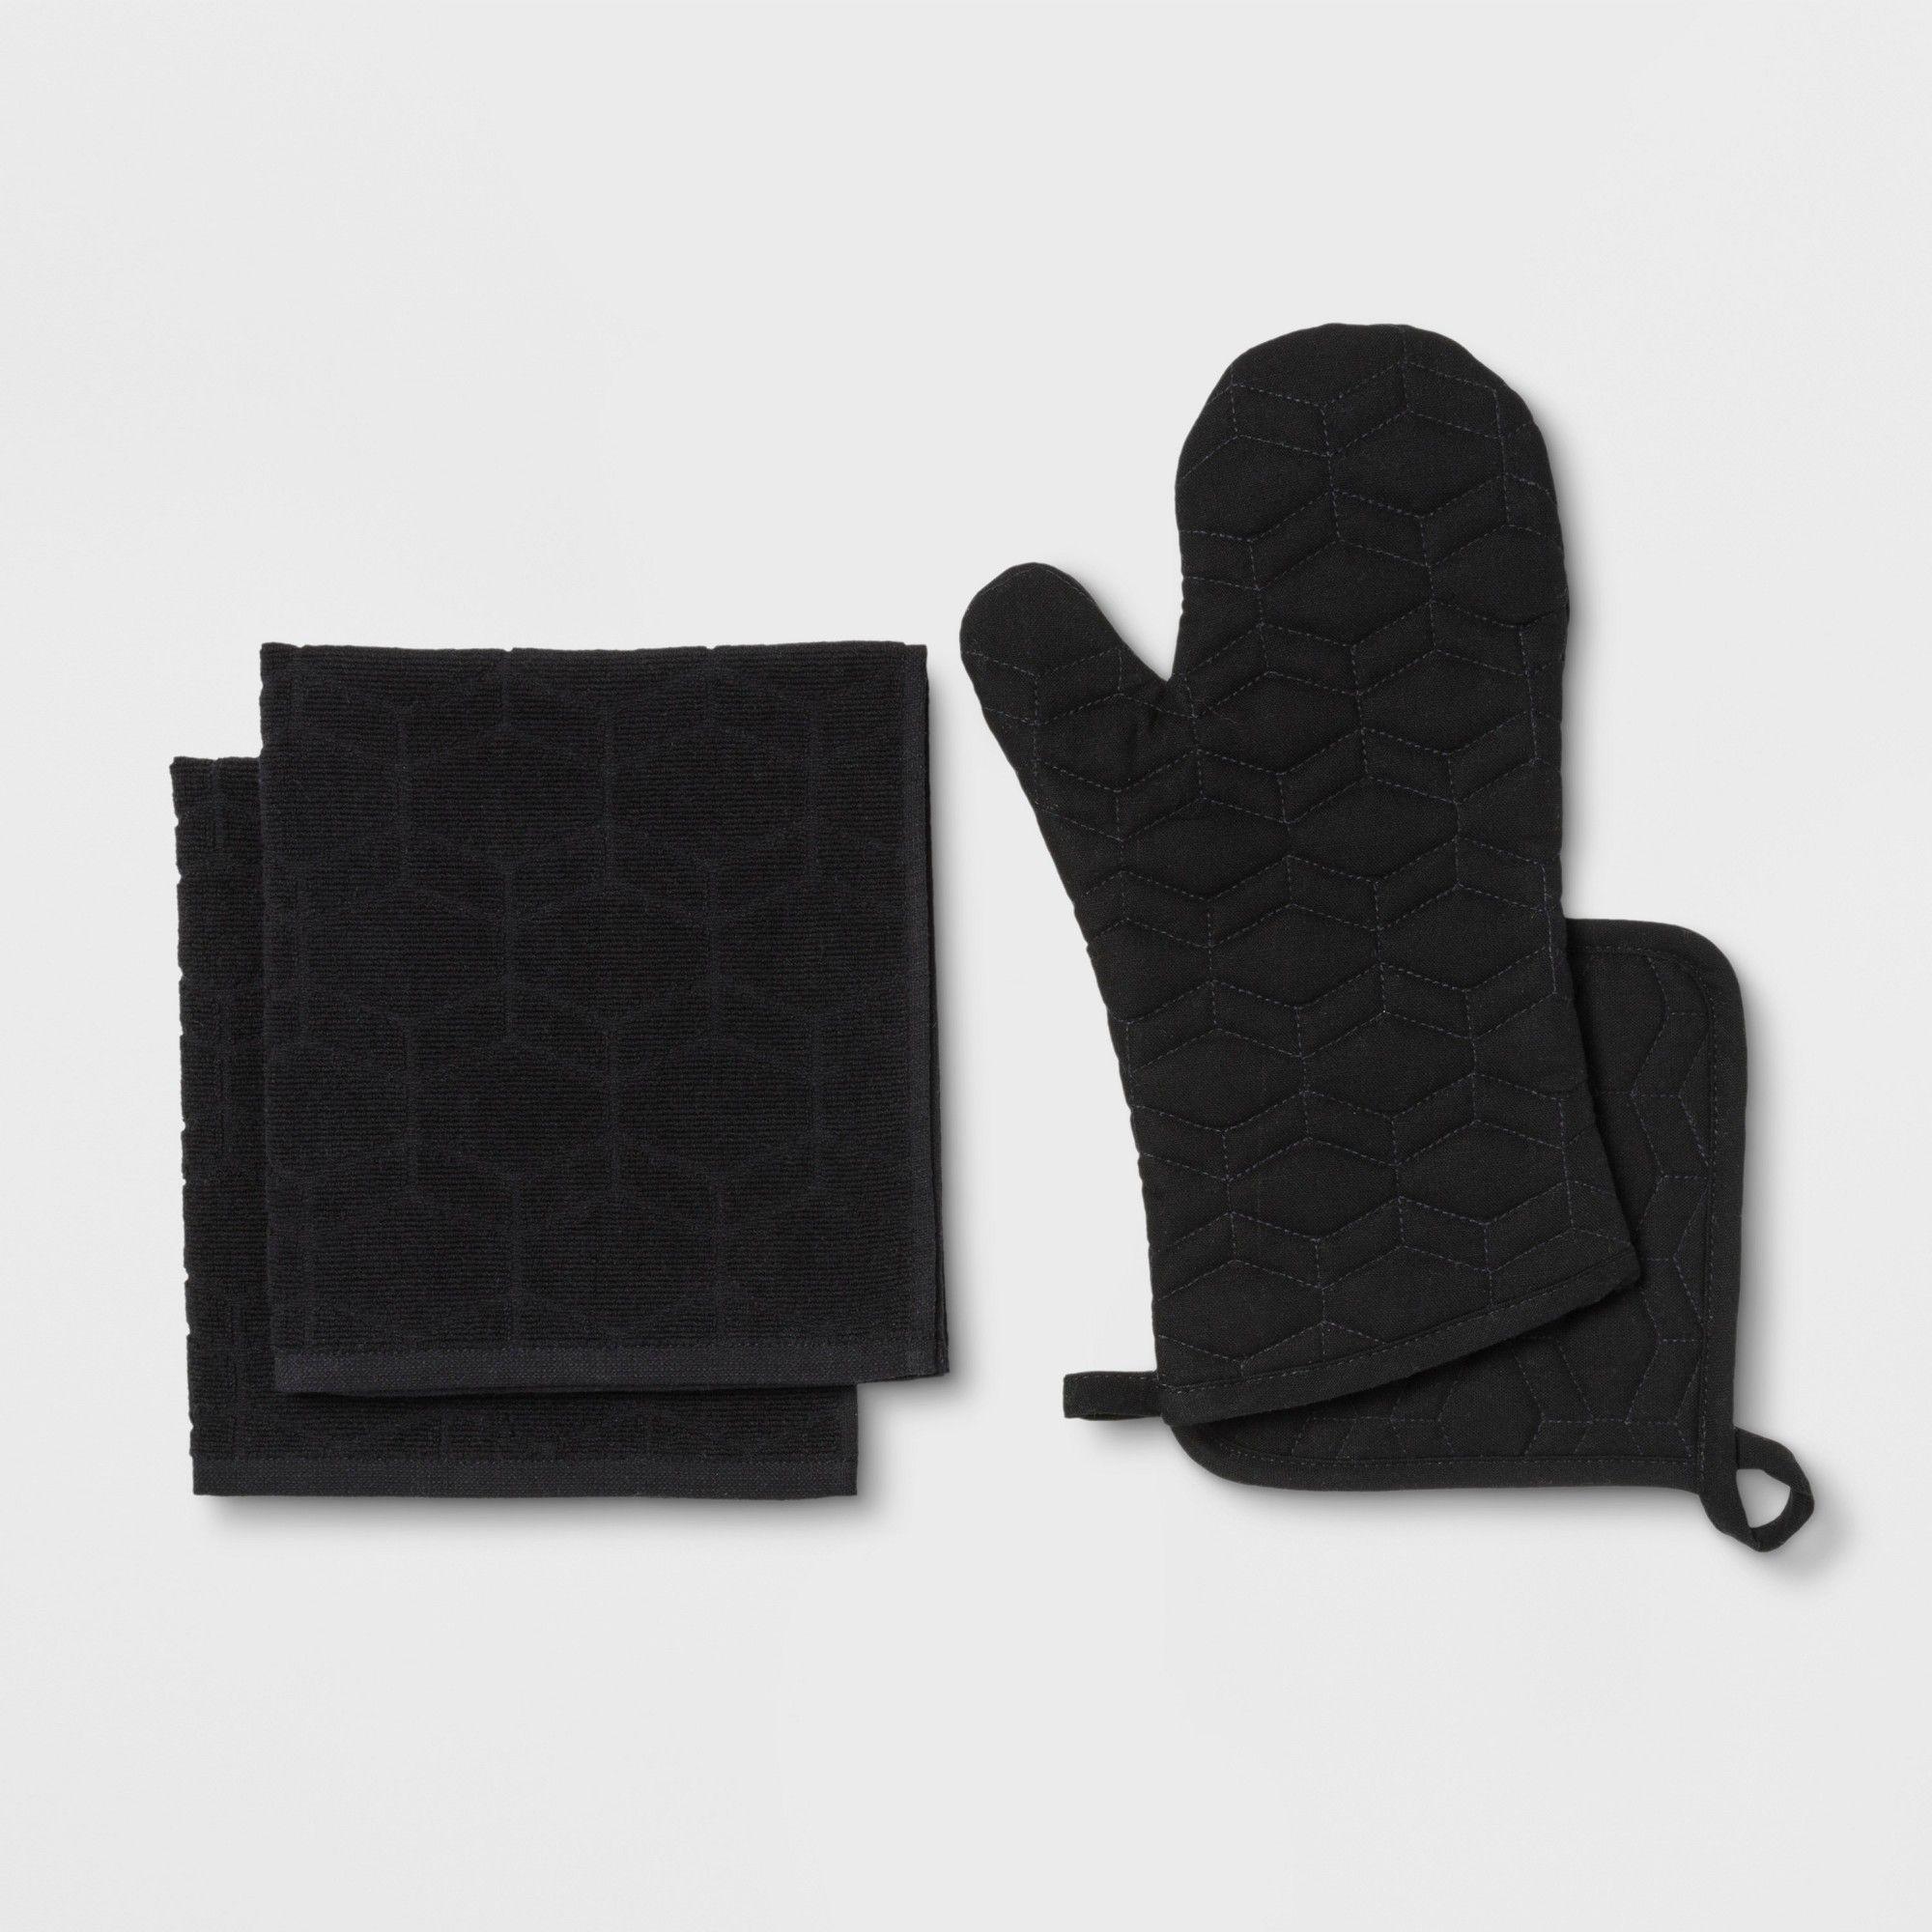 Kitchen Textile Set Black Room Essentials™ (With images